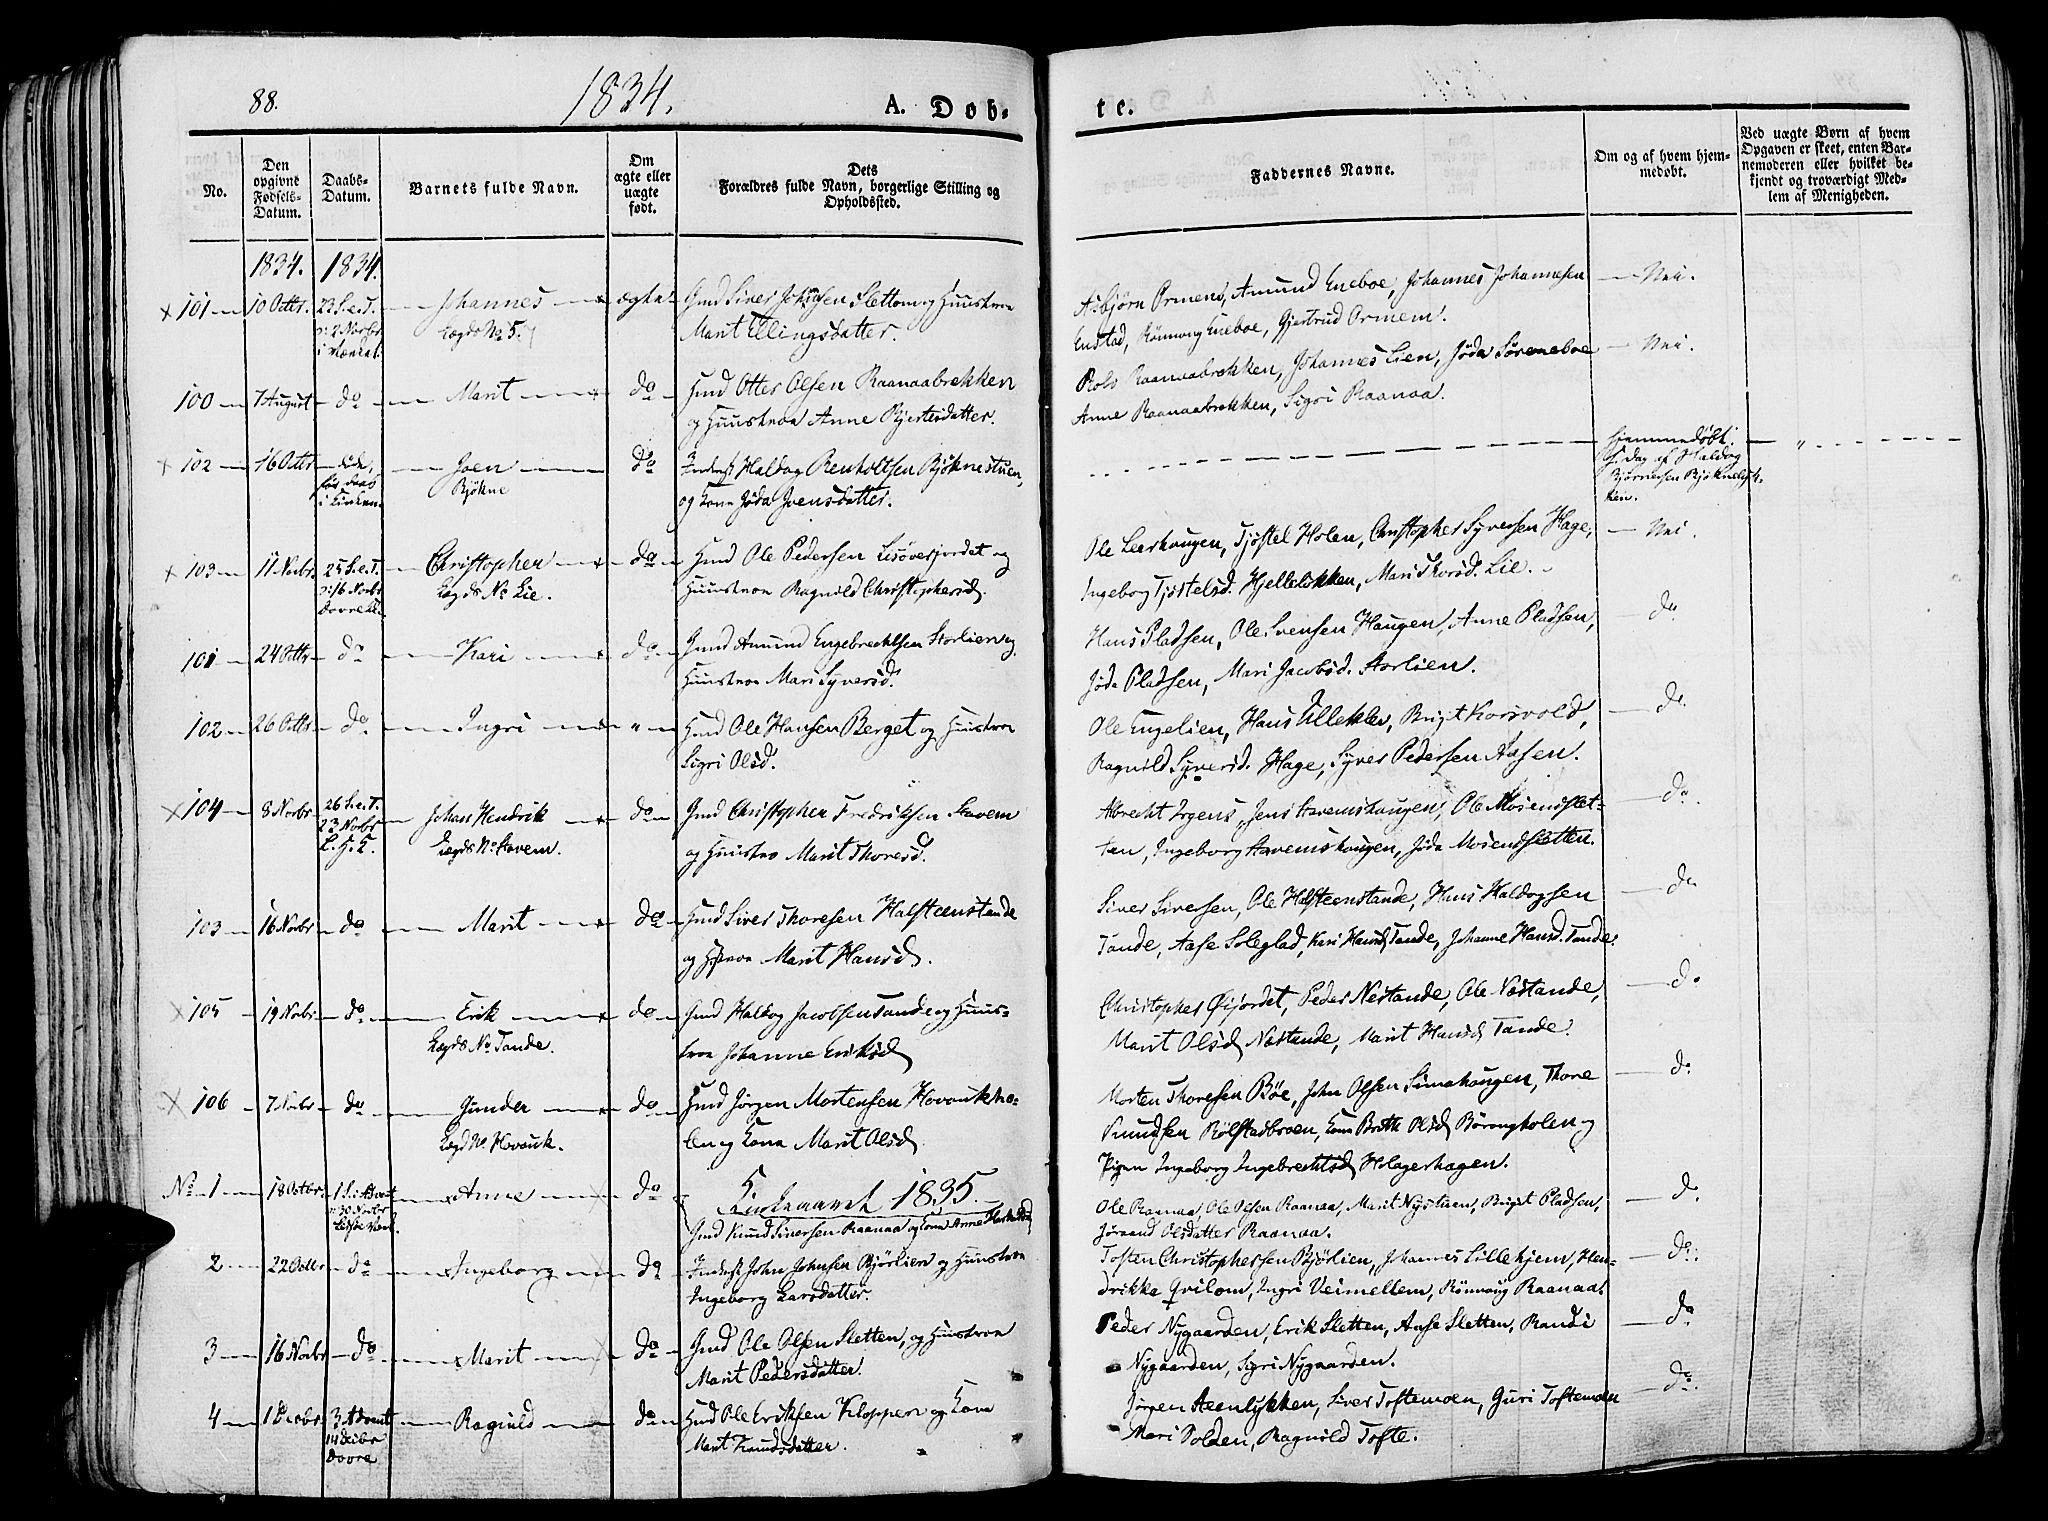 SAH, Lesja prestekontor, Ministerialbok nr. 5, 1830-1842, s. 88